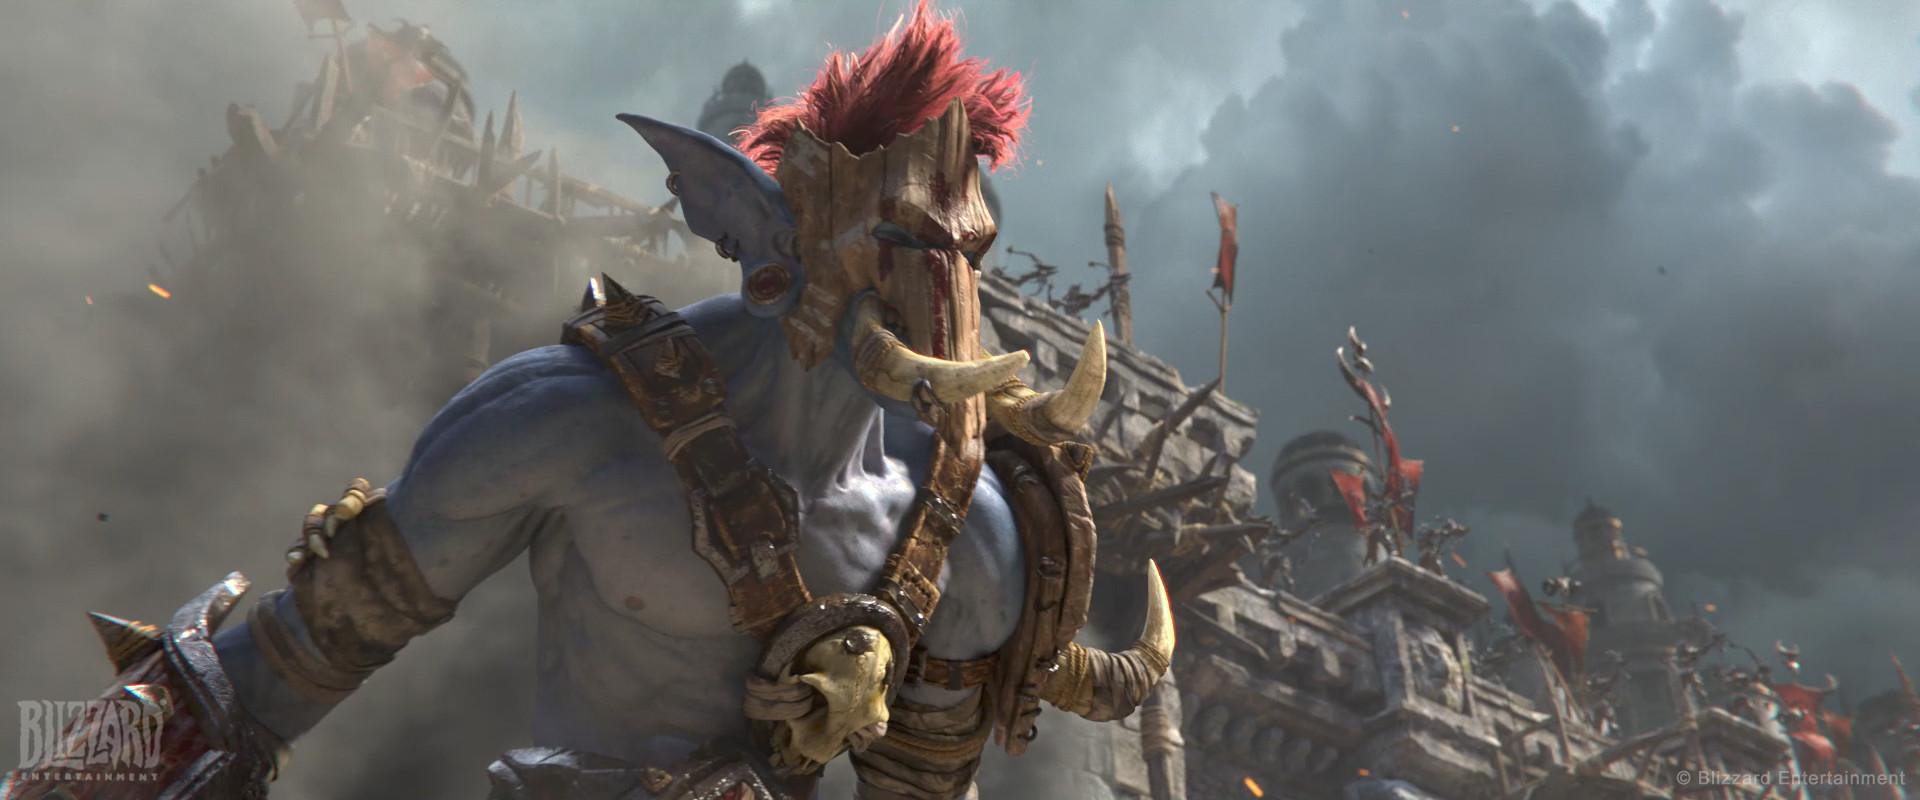 Draenei Girl Wallpaper Artstation World Of Warcraft Battle For Azeroth